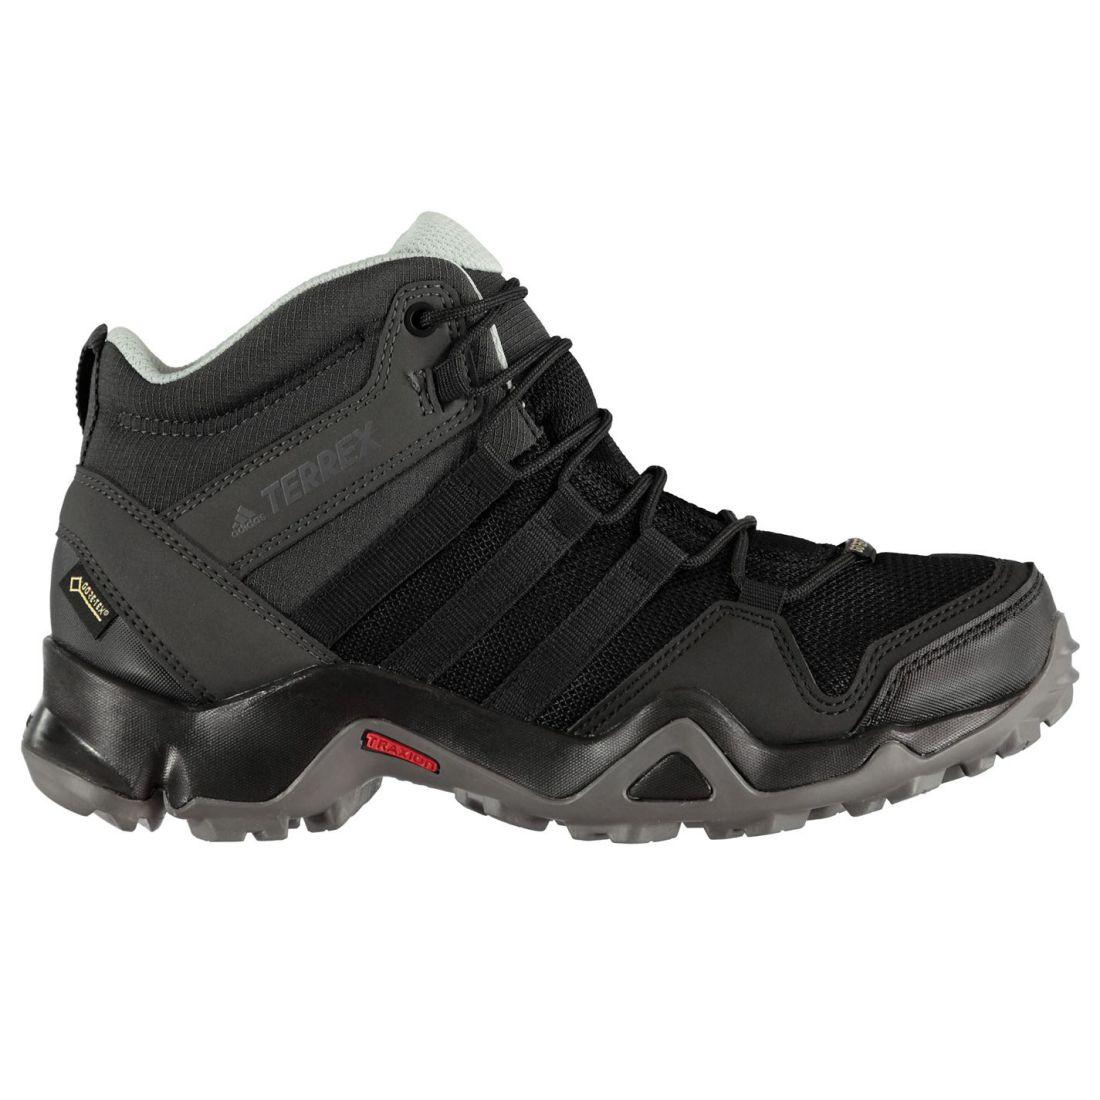 43b450971c0 adidas Womens TERREX AX2R GTX Mid Walking Boots Shoes Lace ...